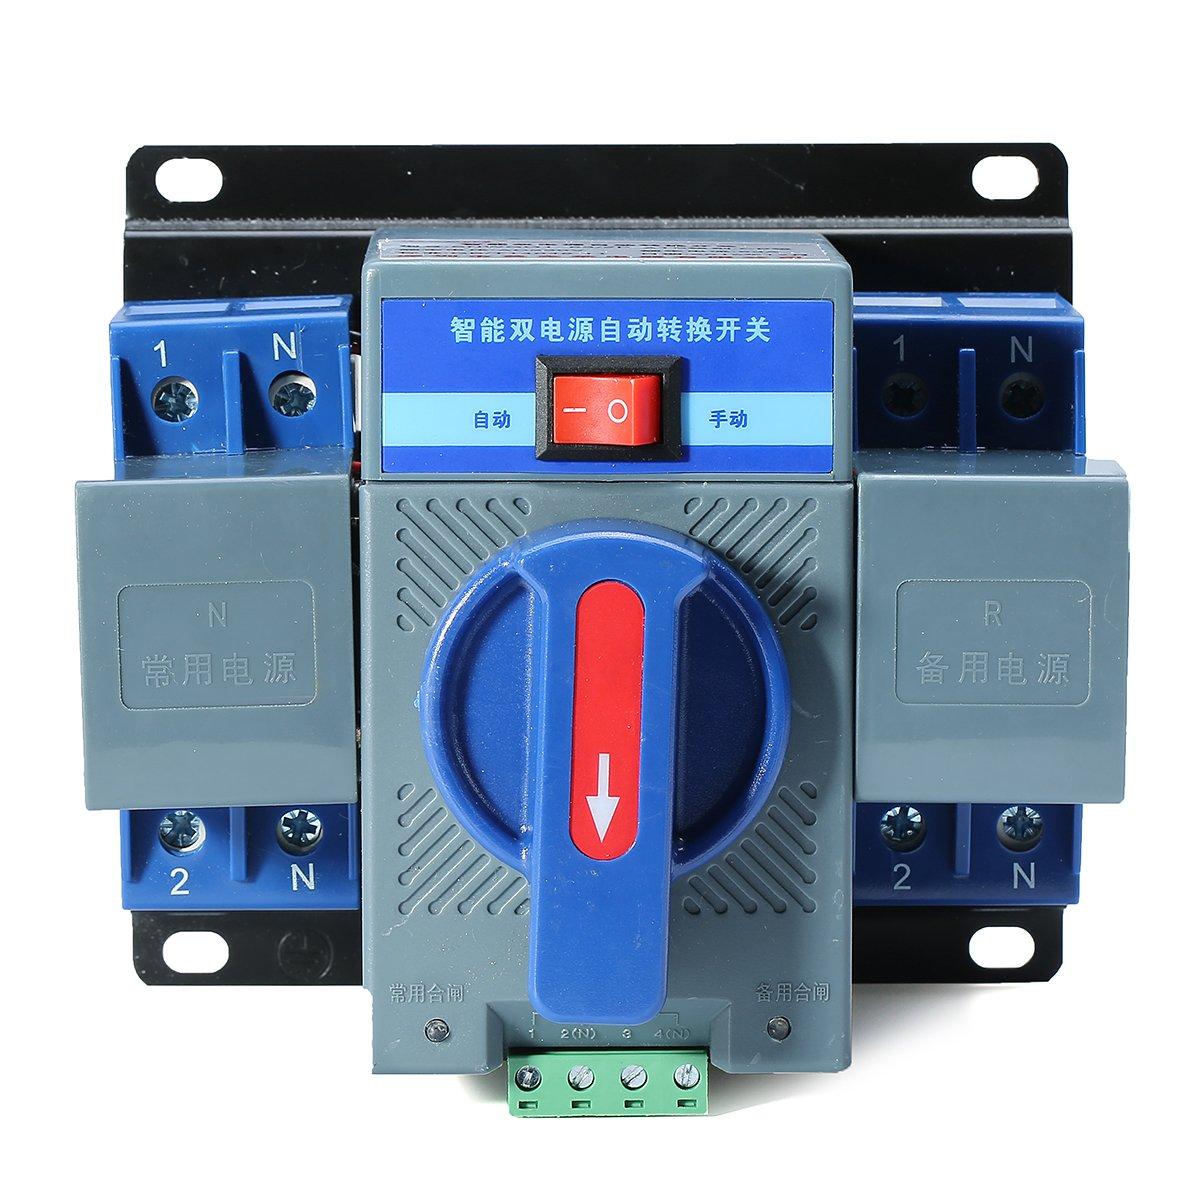 63A 2P 50HZ/60HZ Dual Power Automatic Transfer Switch 150137118mm